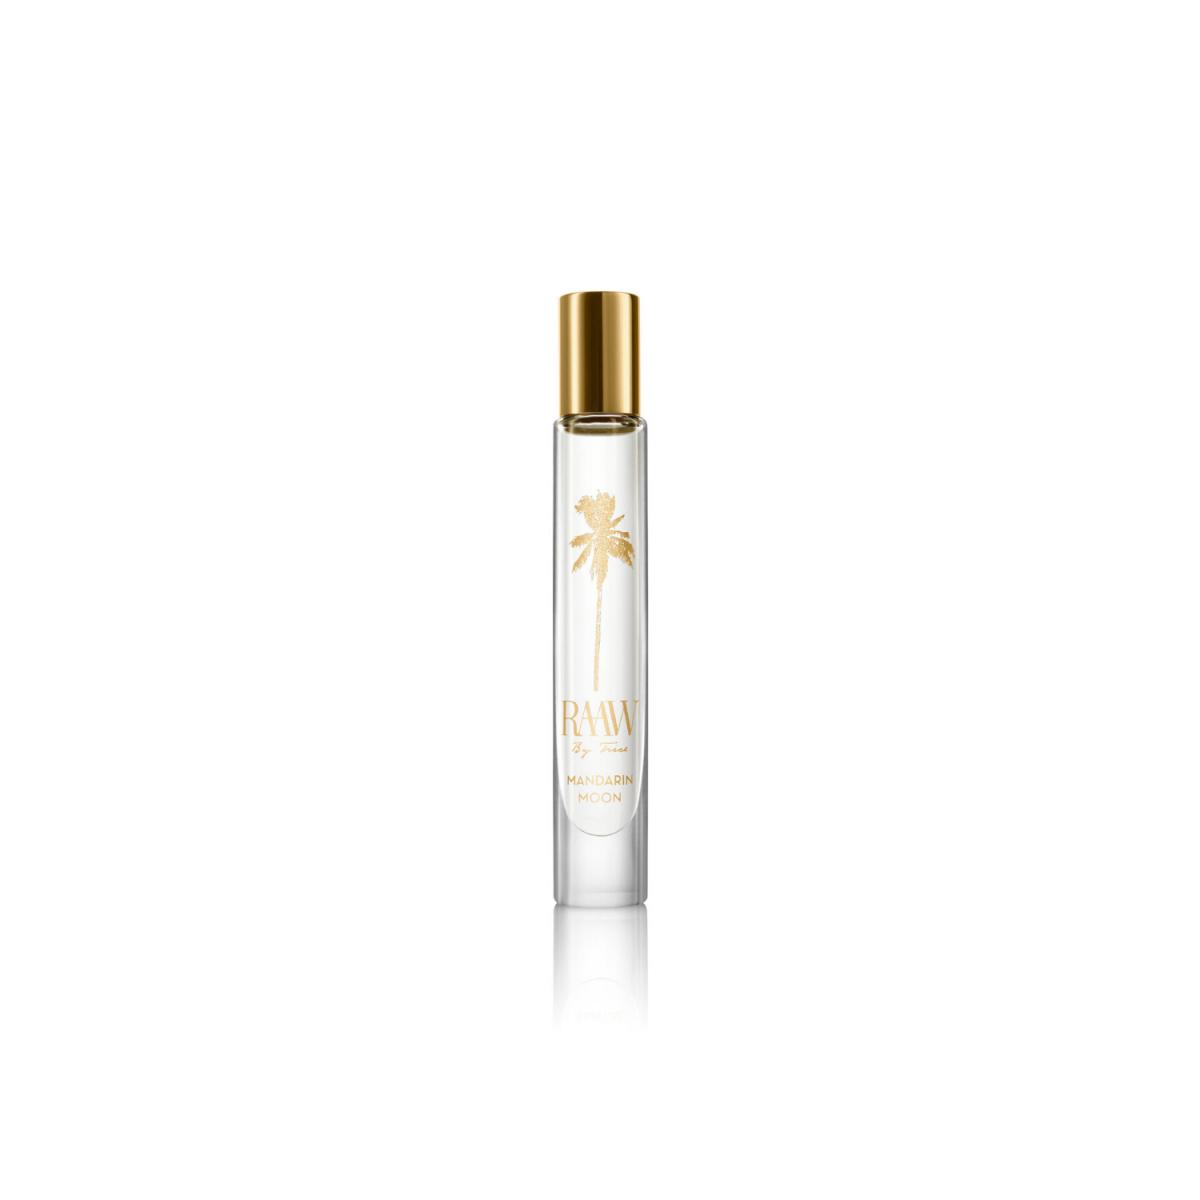 mandarin moon perfume oil